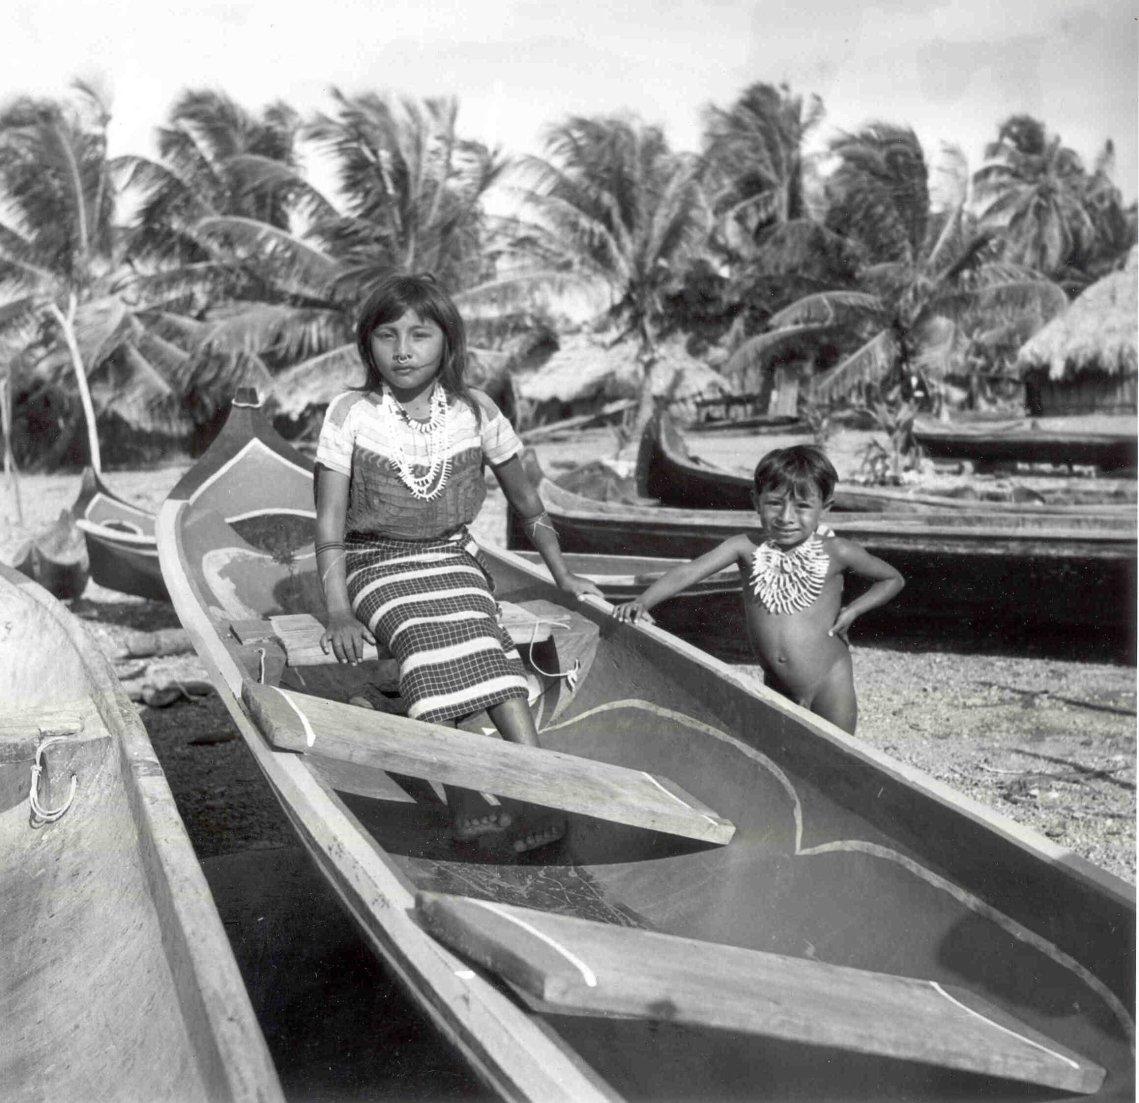 Fotografía de Bill Miller, en Ustupu, década de 1940.